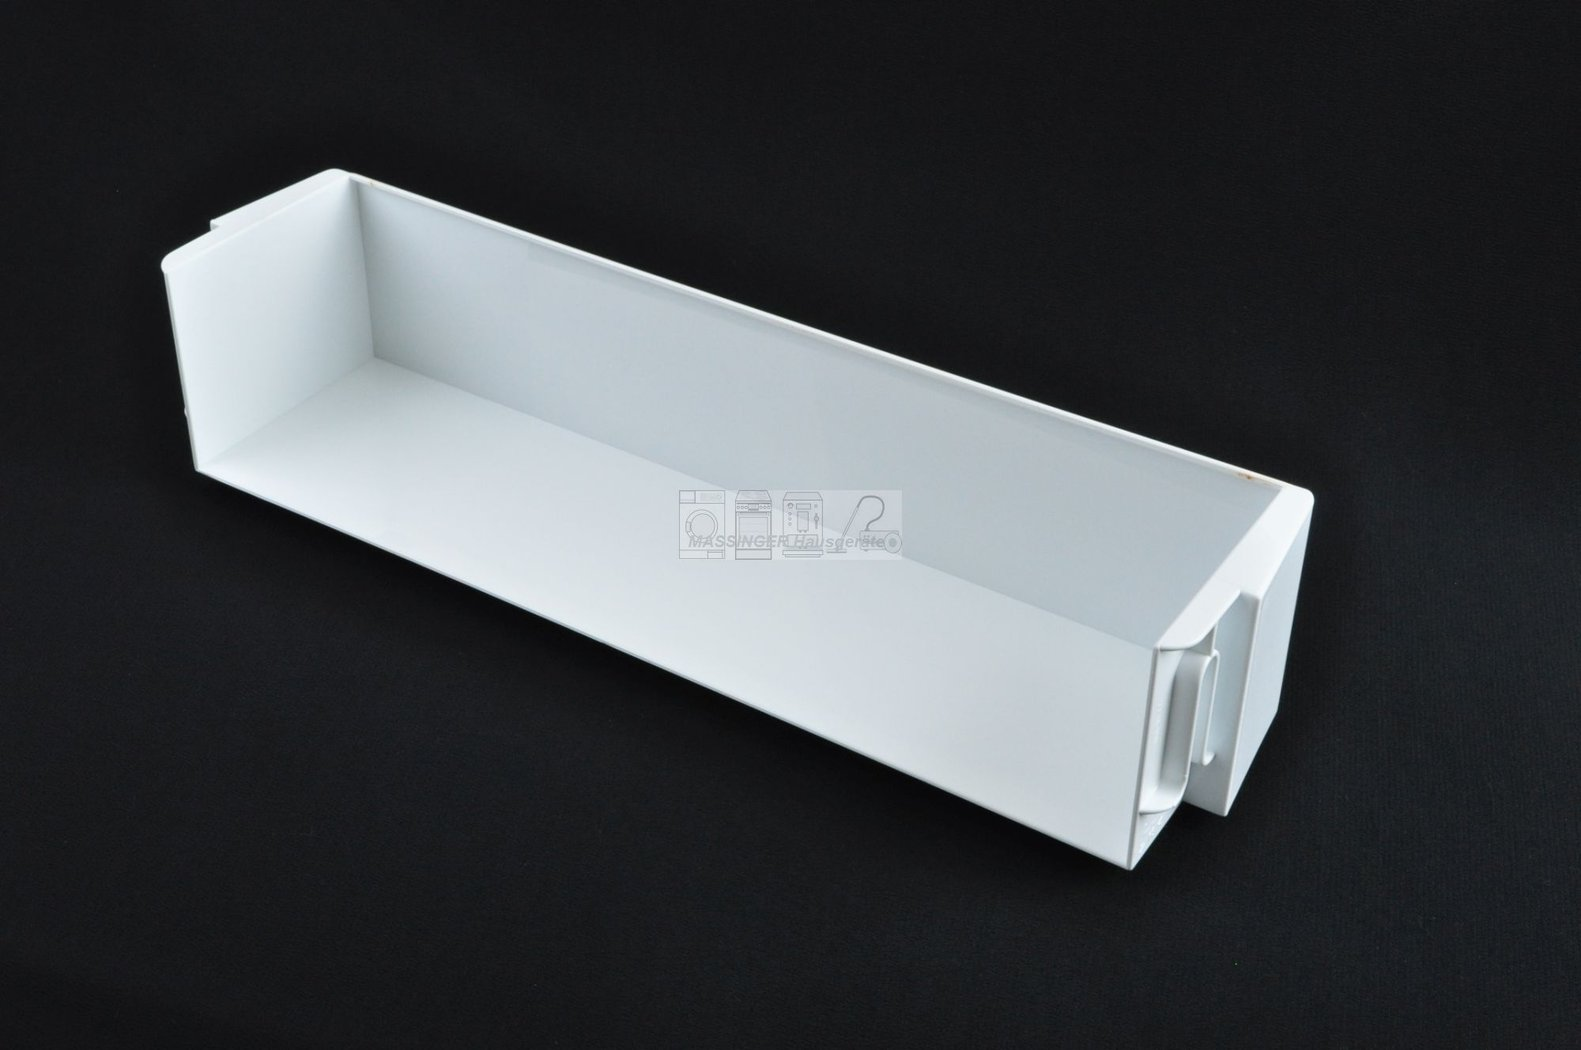 flaschenfach absteller k hlschrank aeg santo 50 cm 2246010173. Black Bedroom Furniture Sets. Home Design Ideas